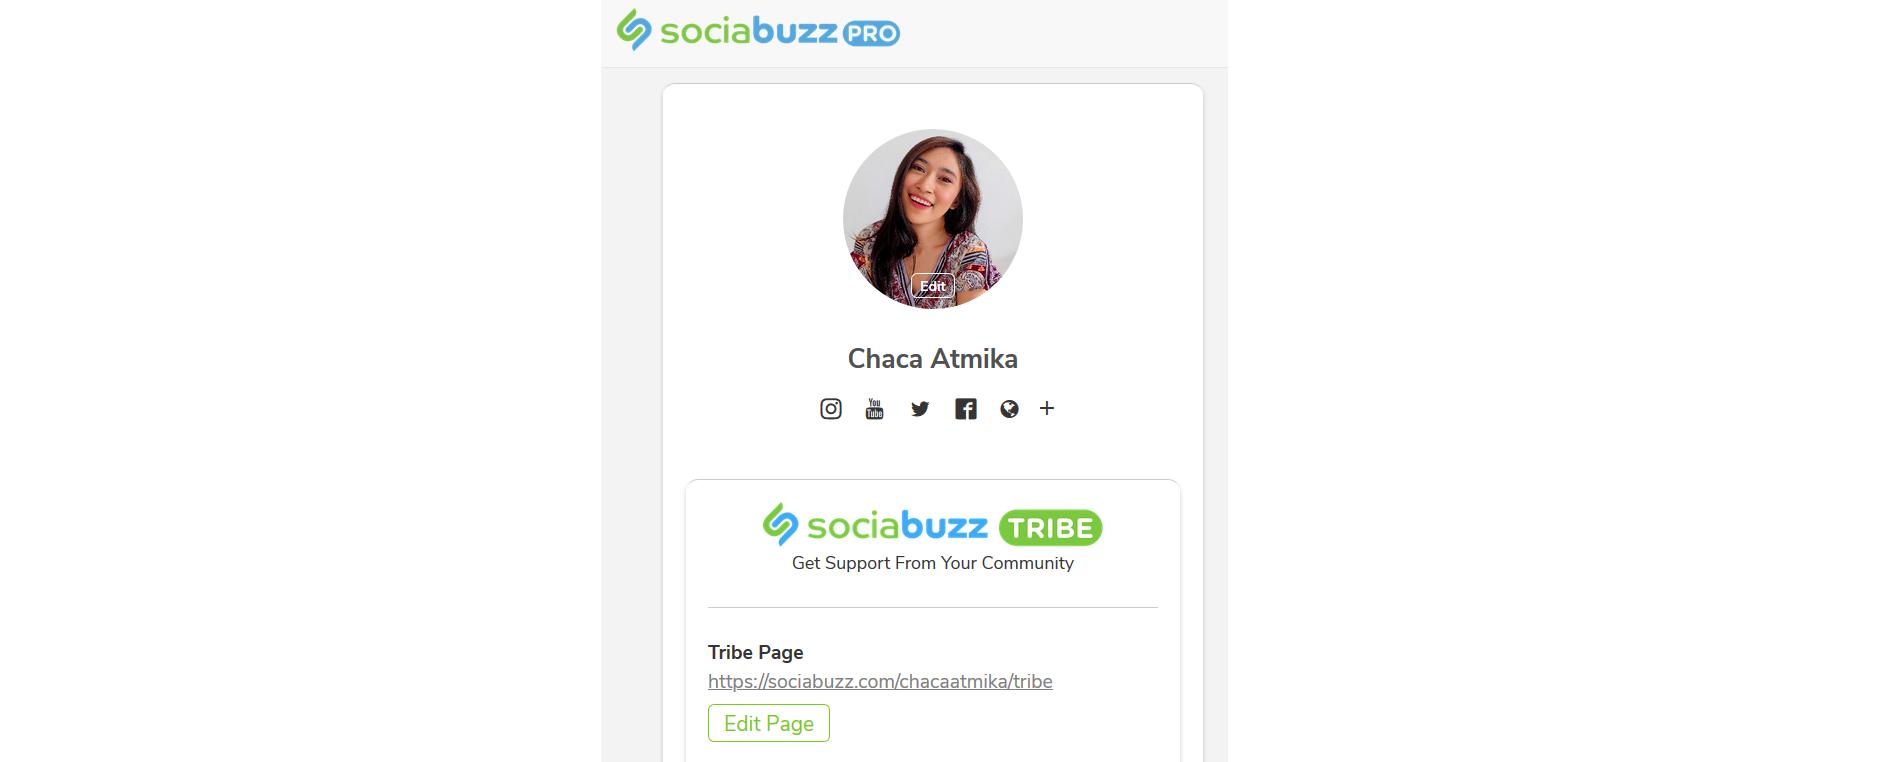 donasi online indonesia di Sociabuss Tribe